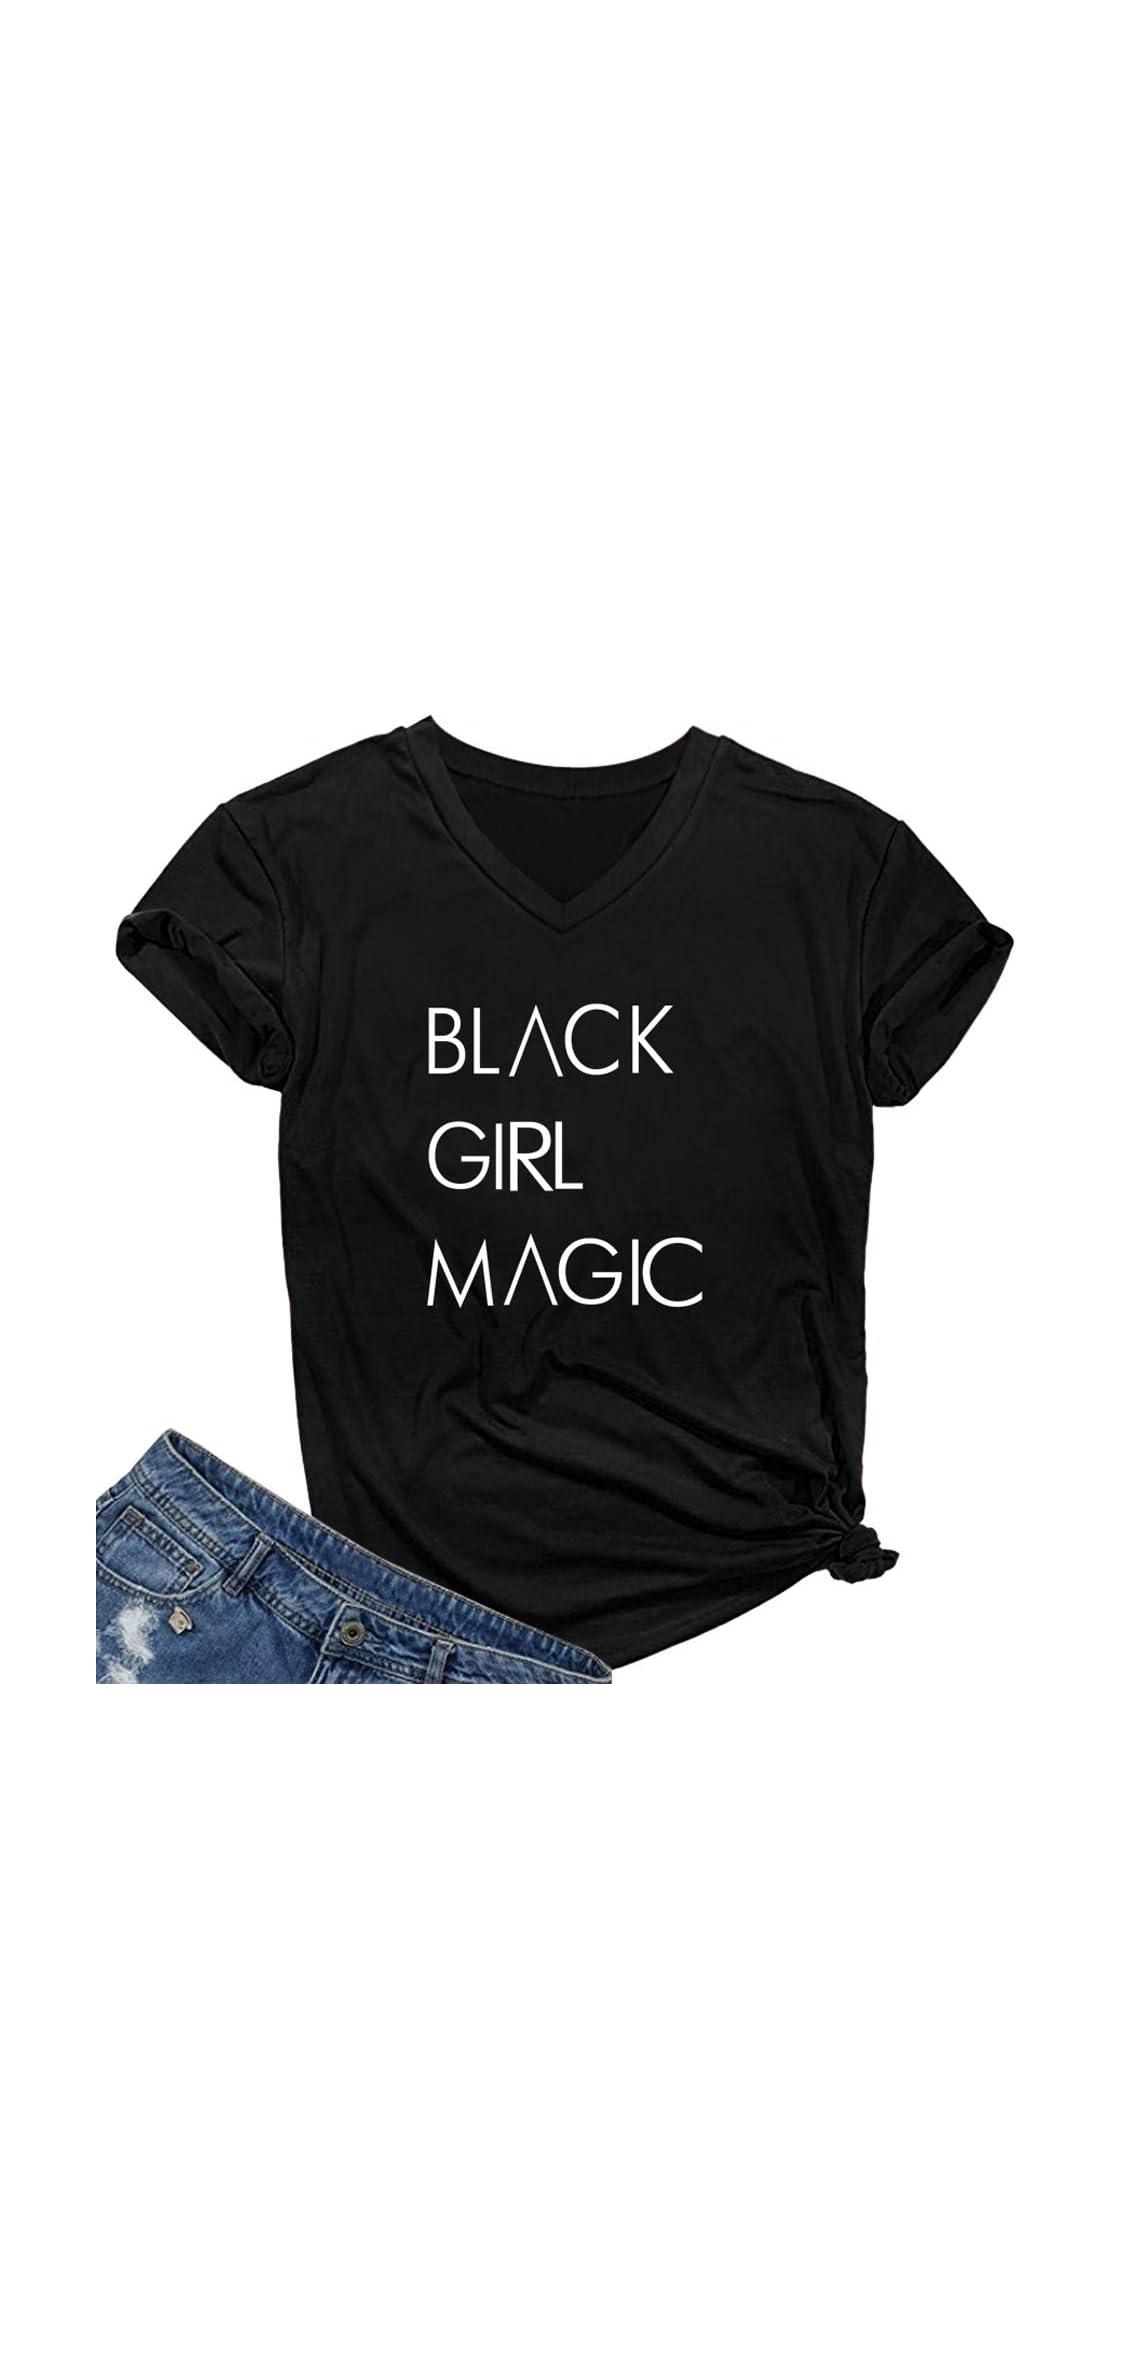 Women Graphic V-neck Black Girl Magic T Shirt Juniors